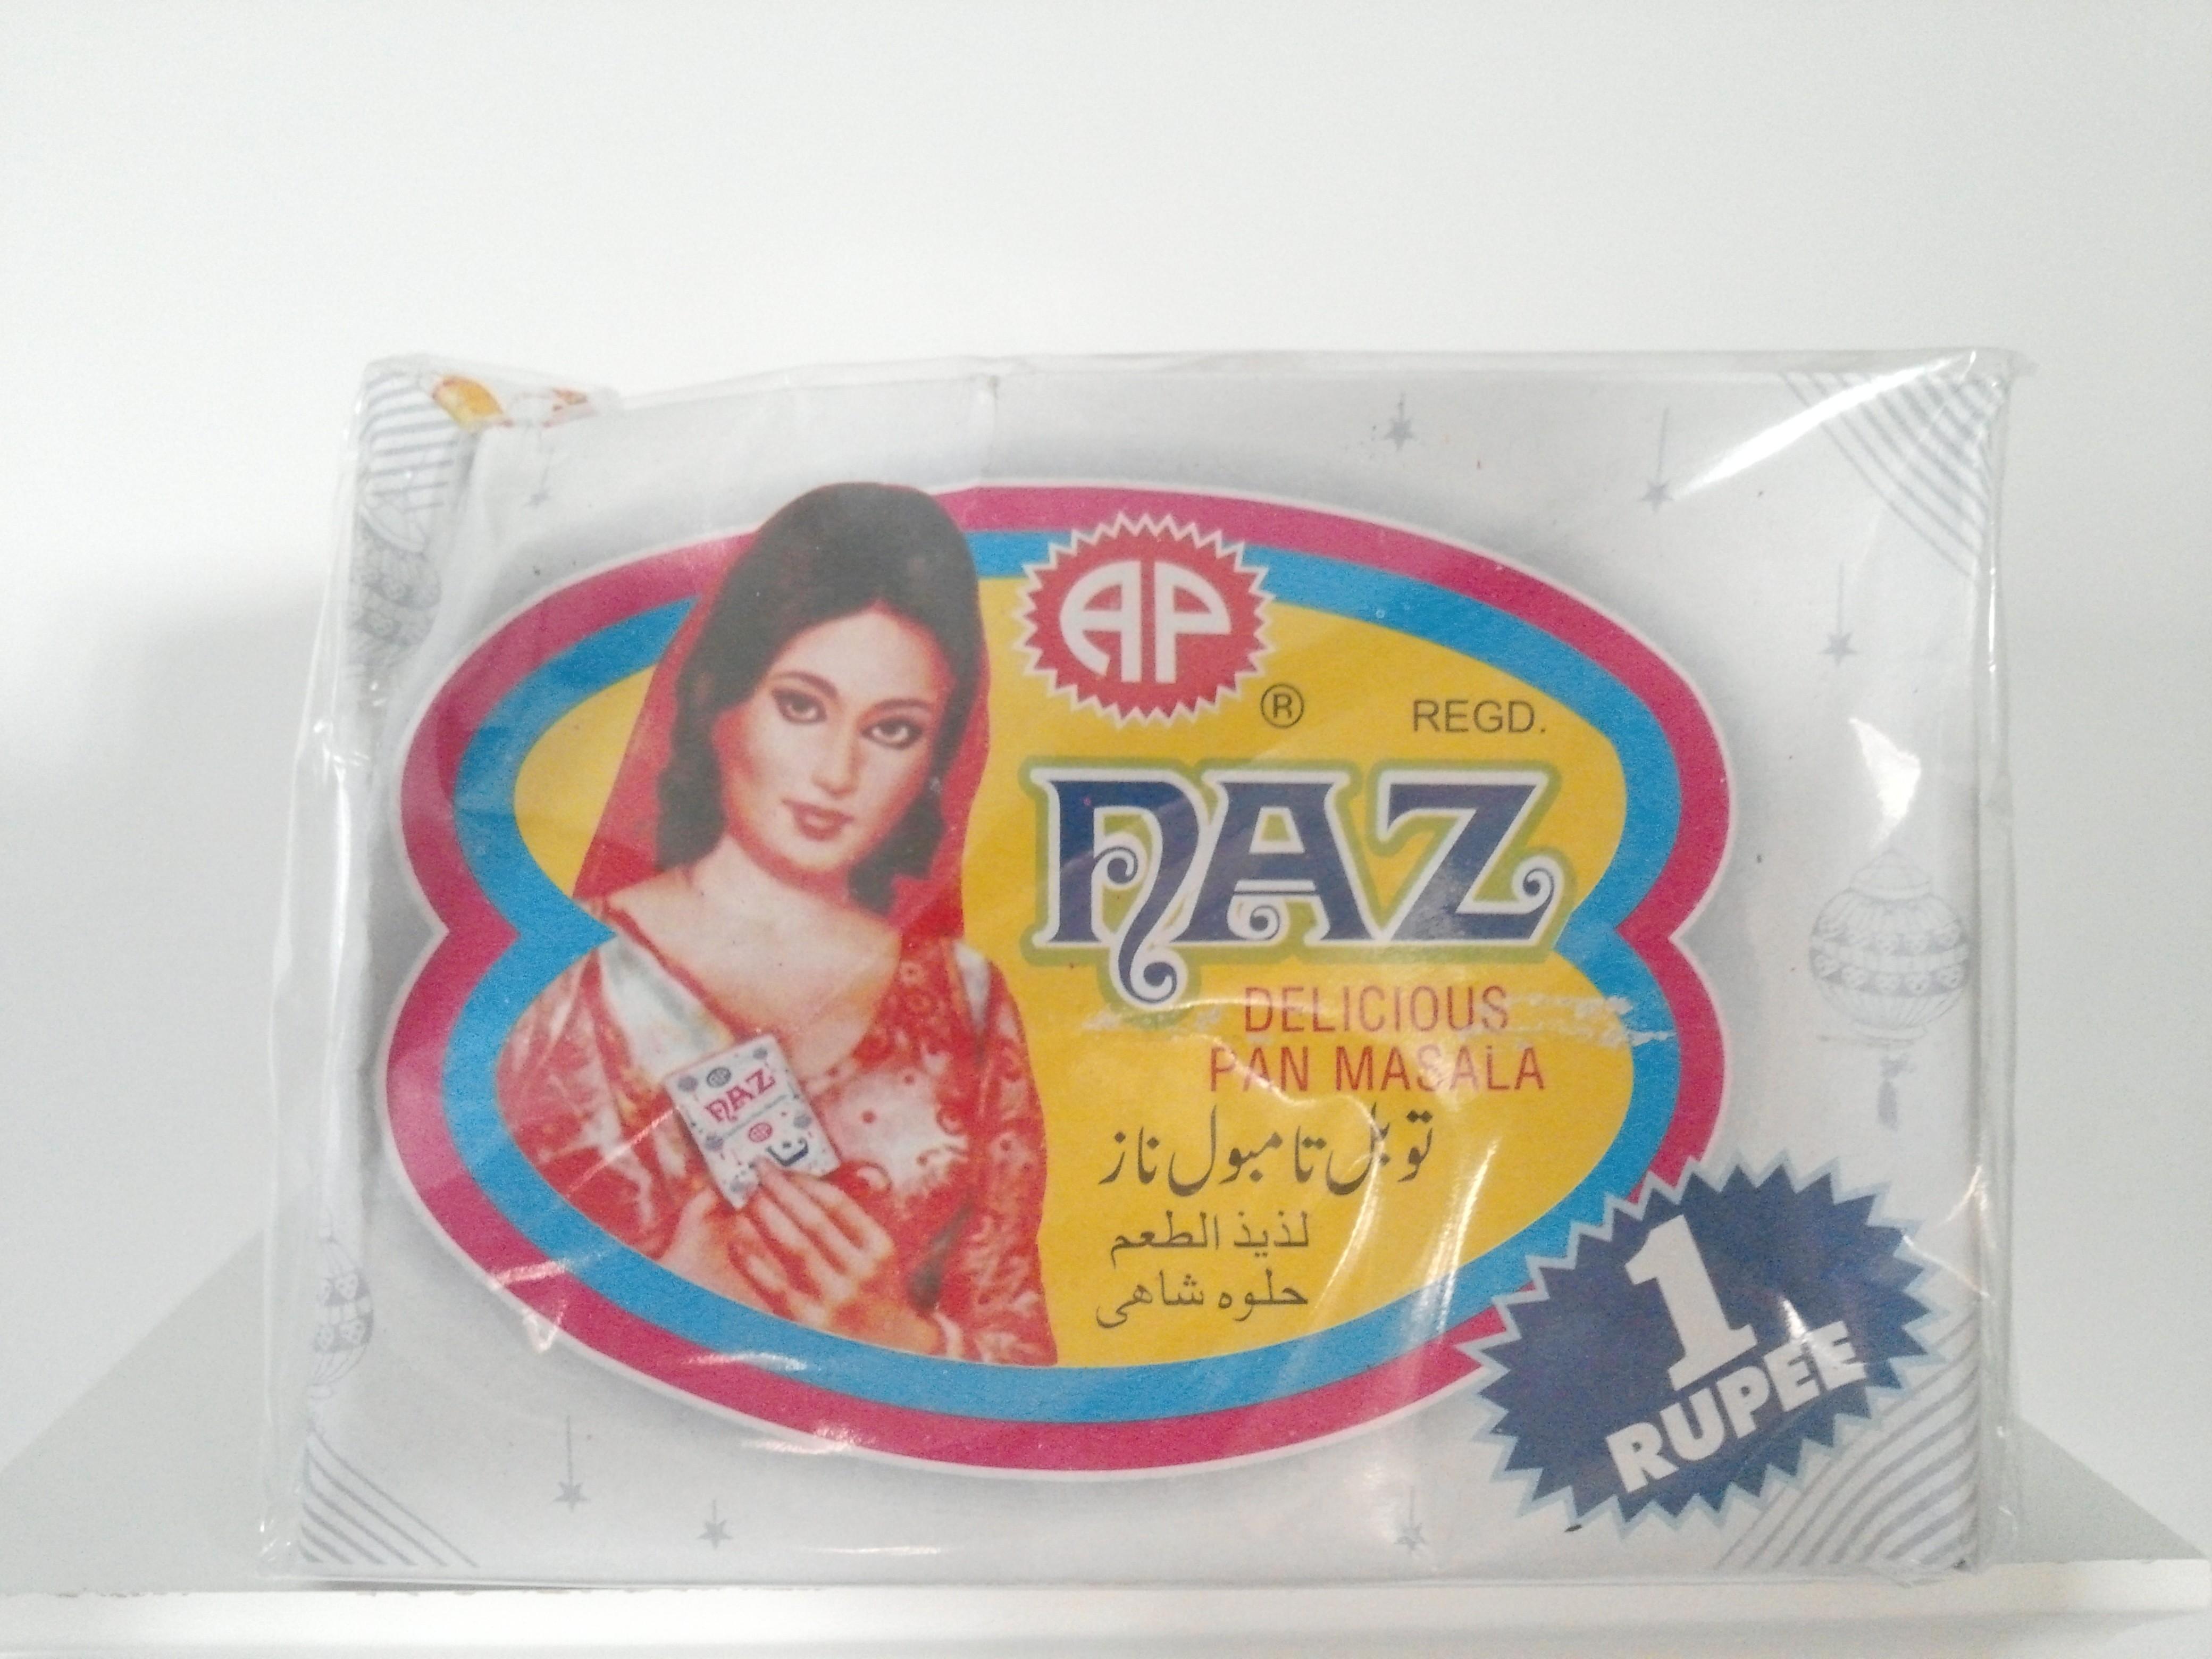 Naz Delicious Pan Masala 200 grm 48 Pack